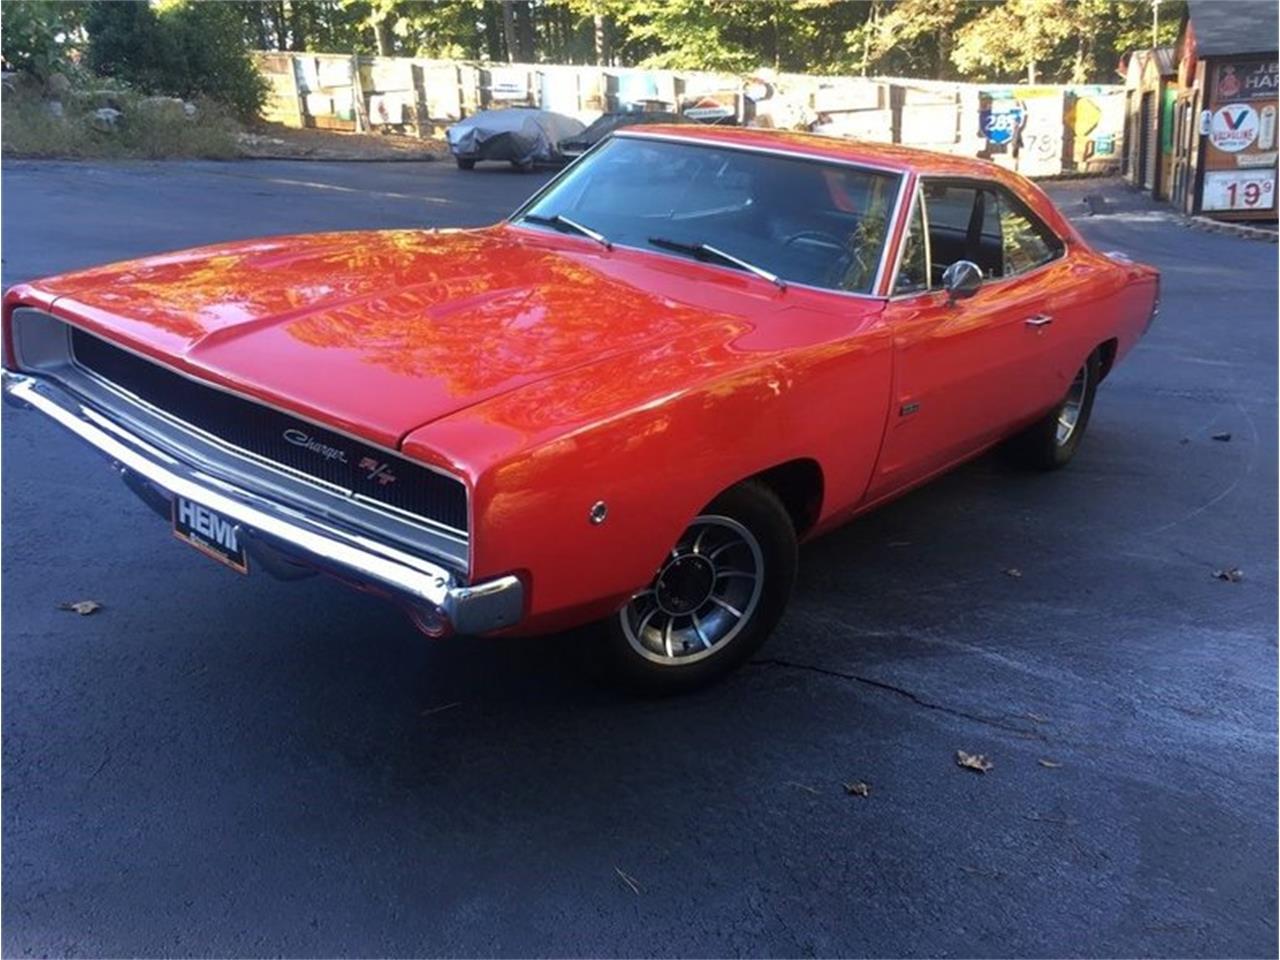 for sale at auction 1968 dodge charger in greensboro, north carolina cars - greensboro, nc at geebo